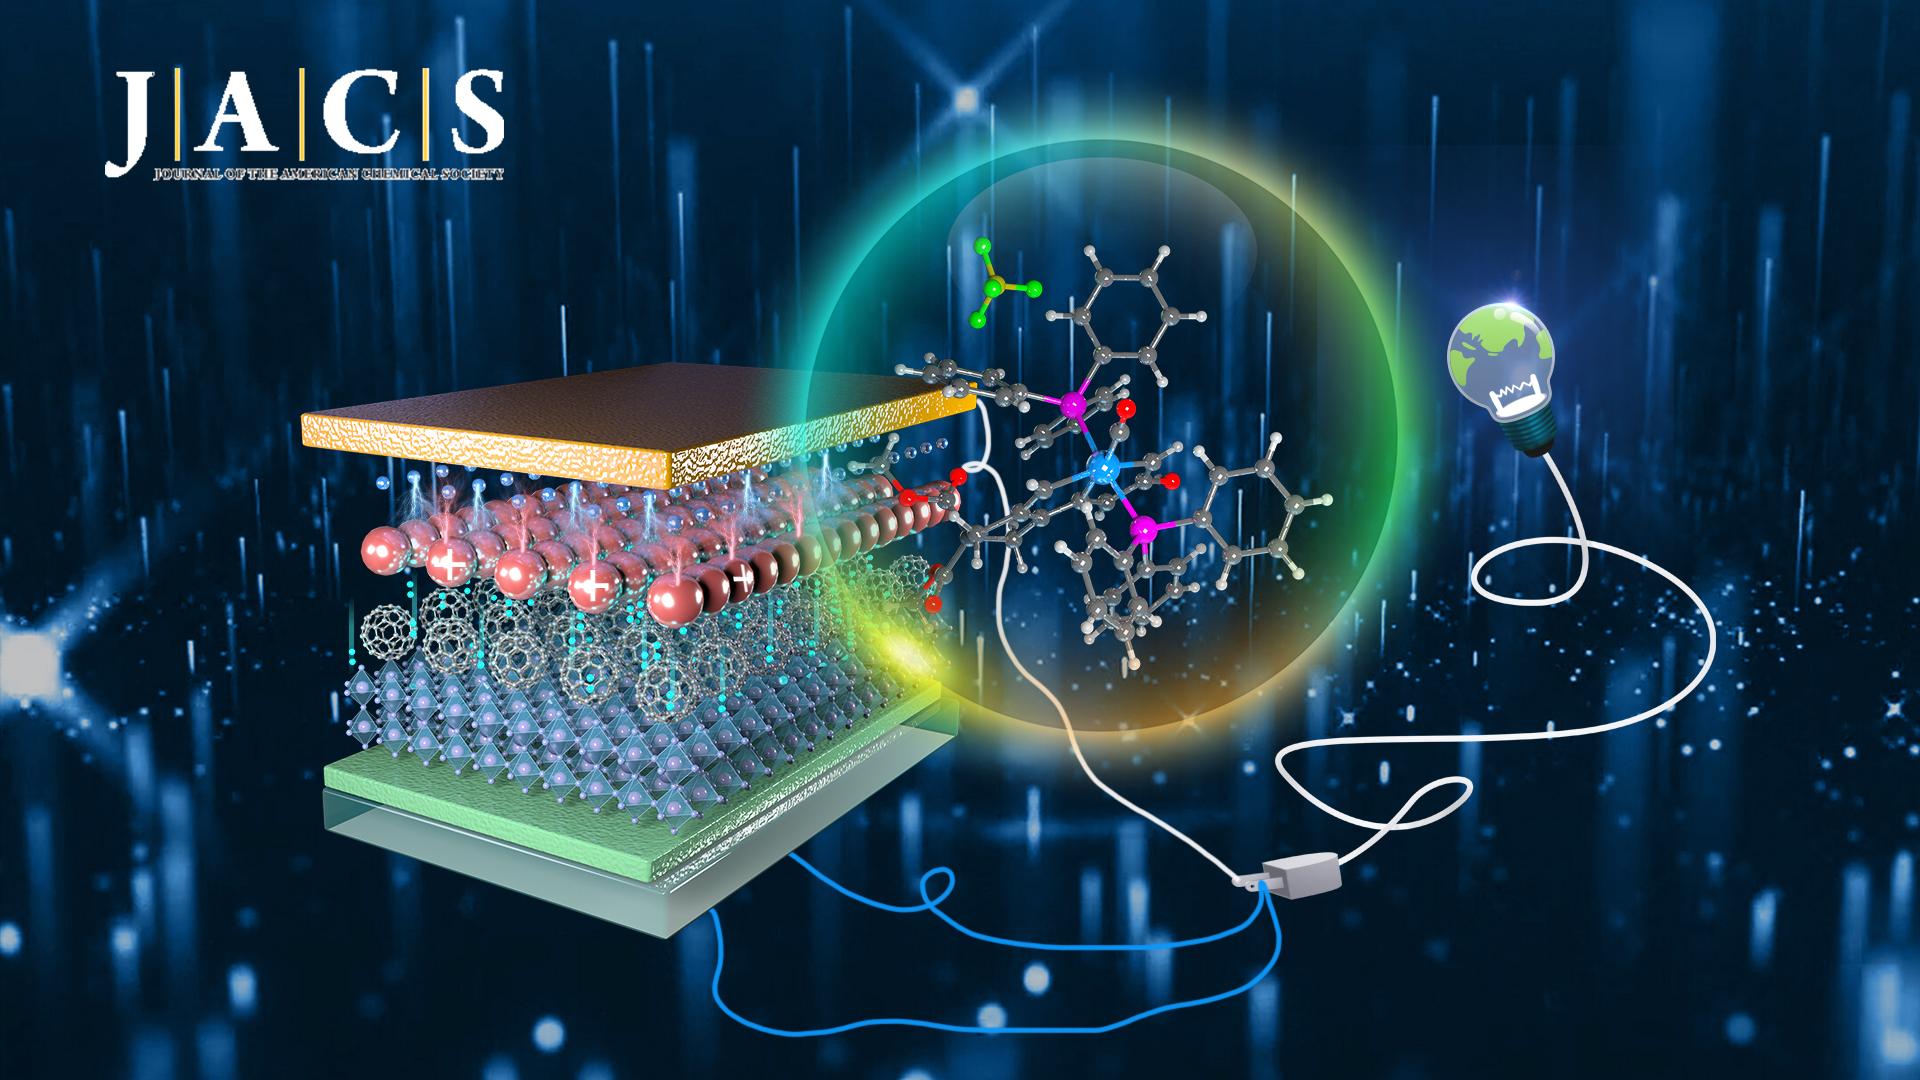 SUSTech researchers make significant progress in cathode interfacial materials in perovskite solar cells